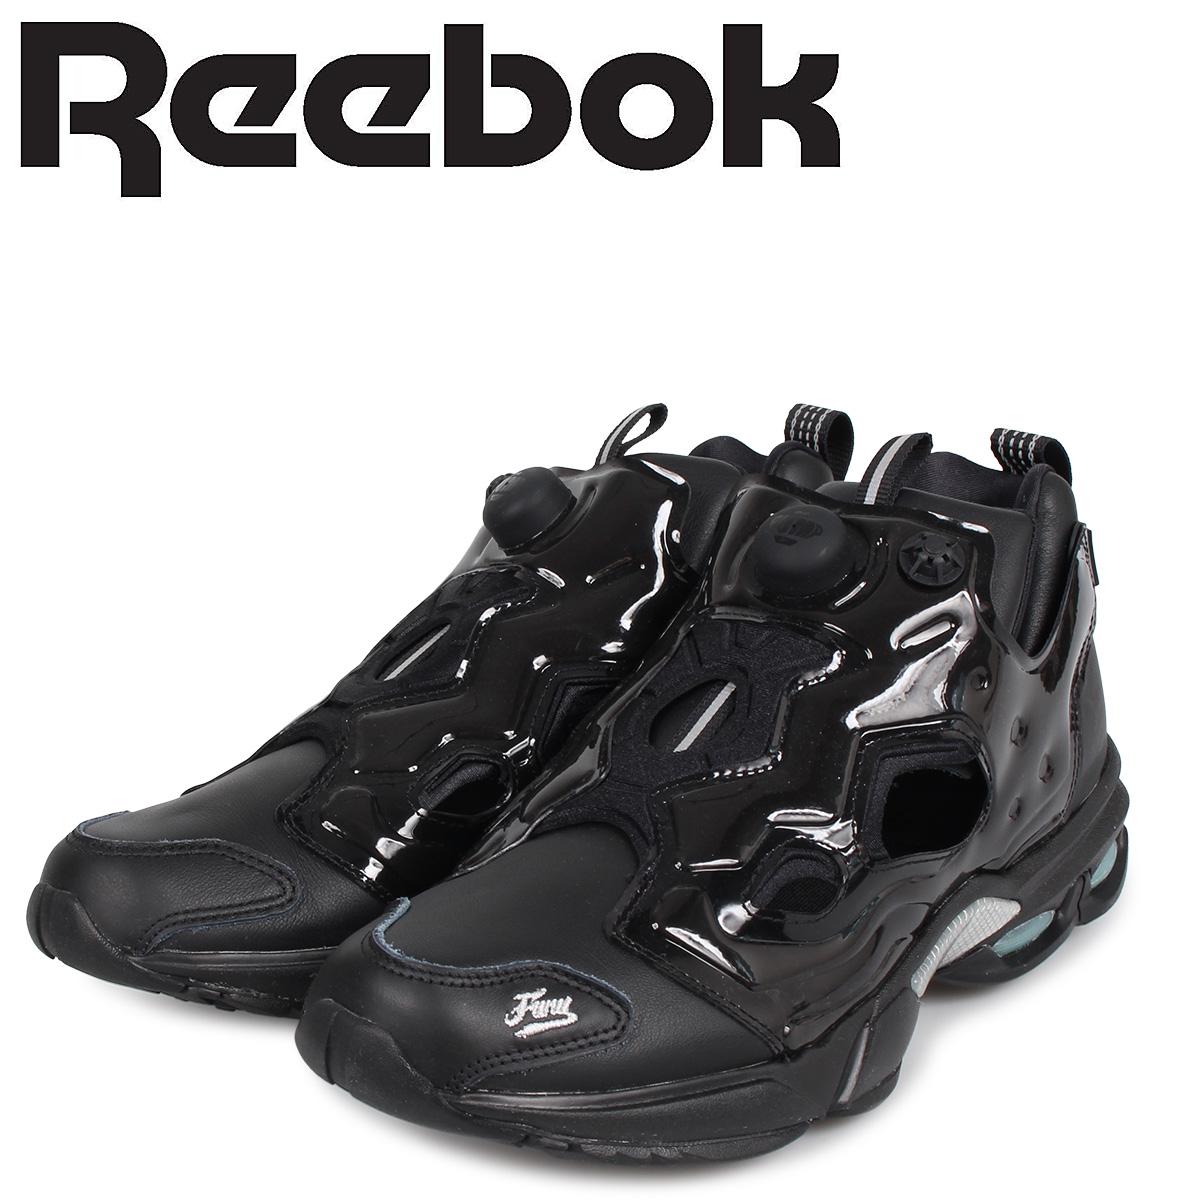 Reebok リーボック フューリー ミレニアム スニーカー メンズ FURY MILLENNIUM ブラック 黒 DV7676